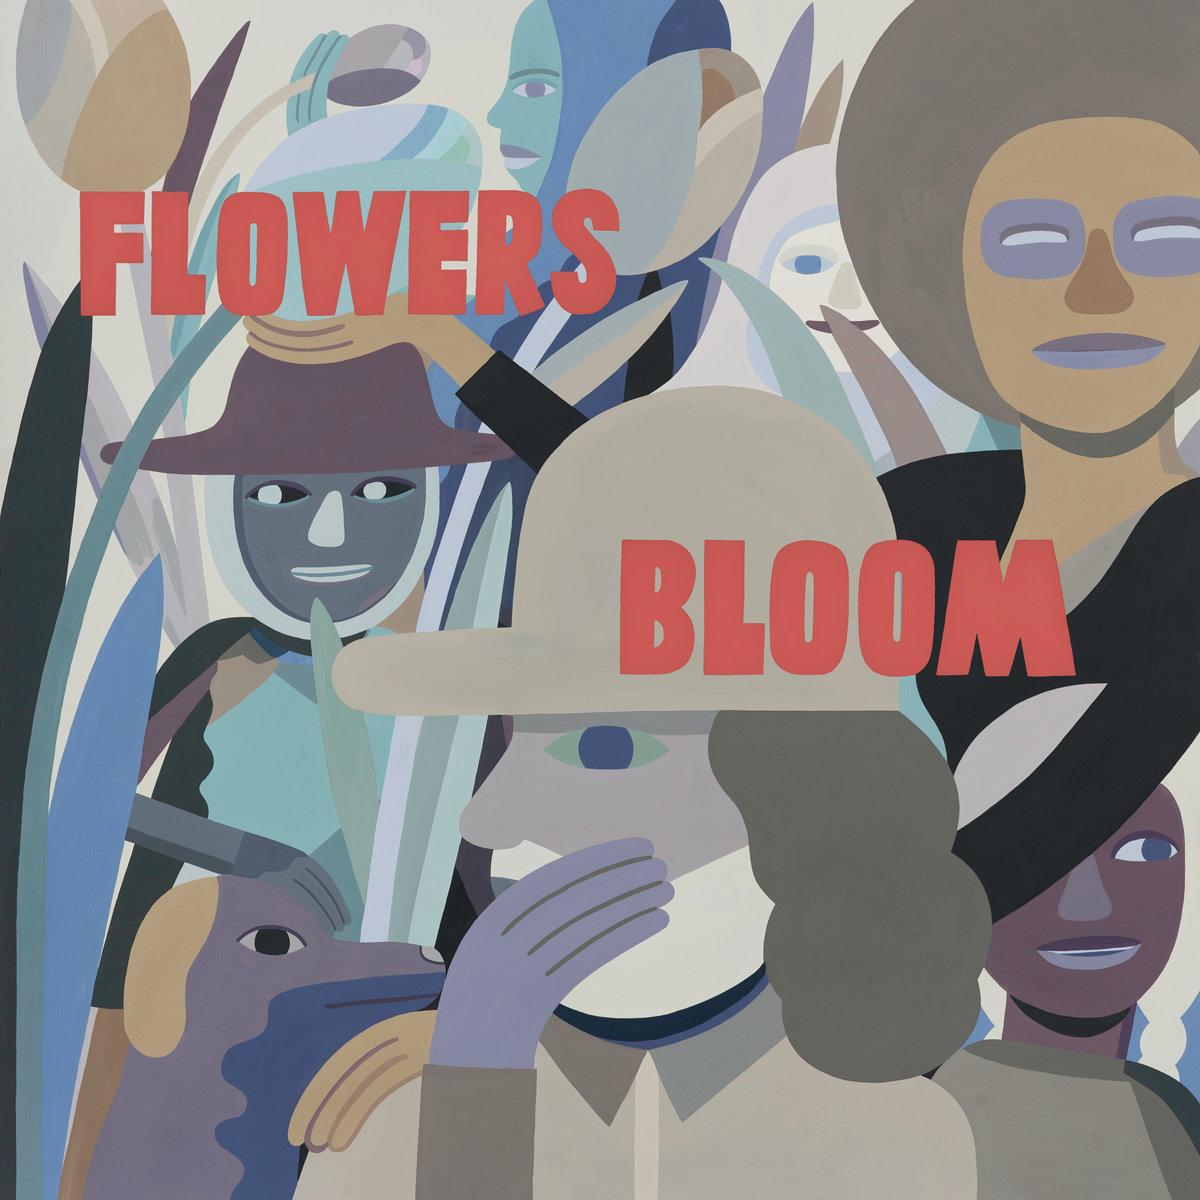 The Mixtapers feat. Georgia Anne Muldrow & Dudley Perkins – Flowers /Bloom